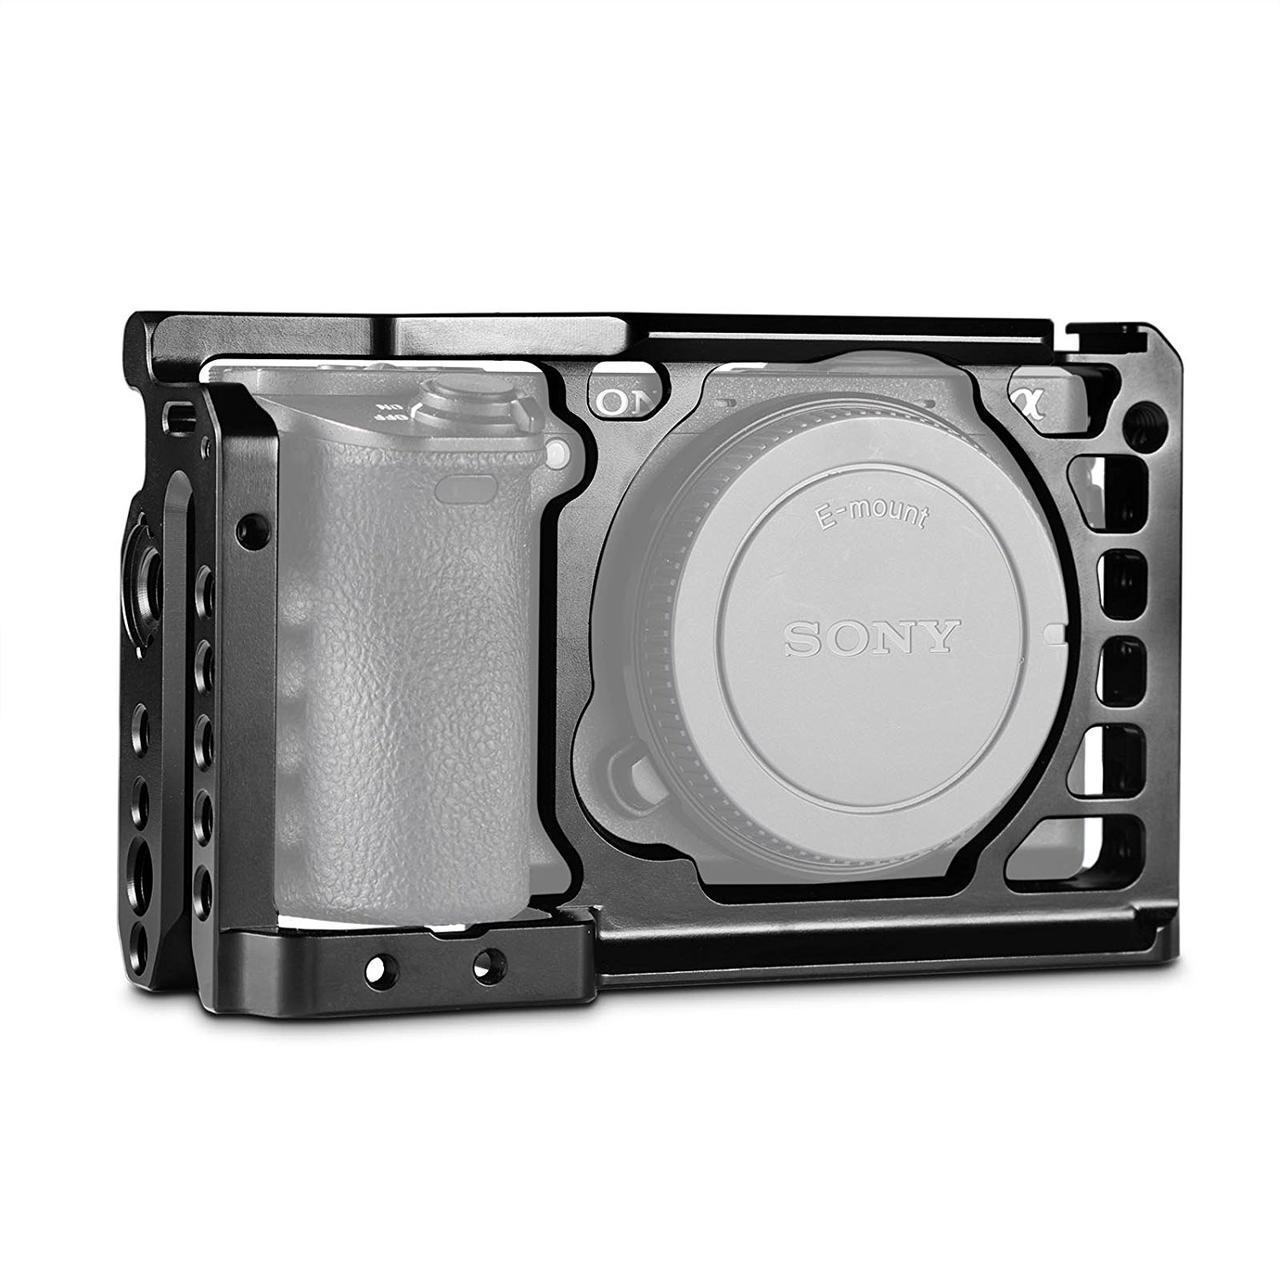 Клетка SmallRig для Sony A6500,A6300,A6000,A6100,A6400,A6600 cage 1889.